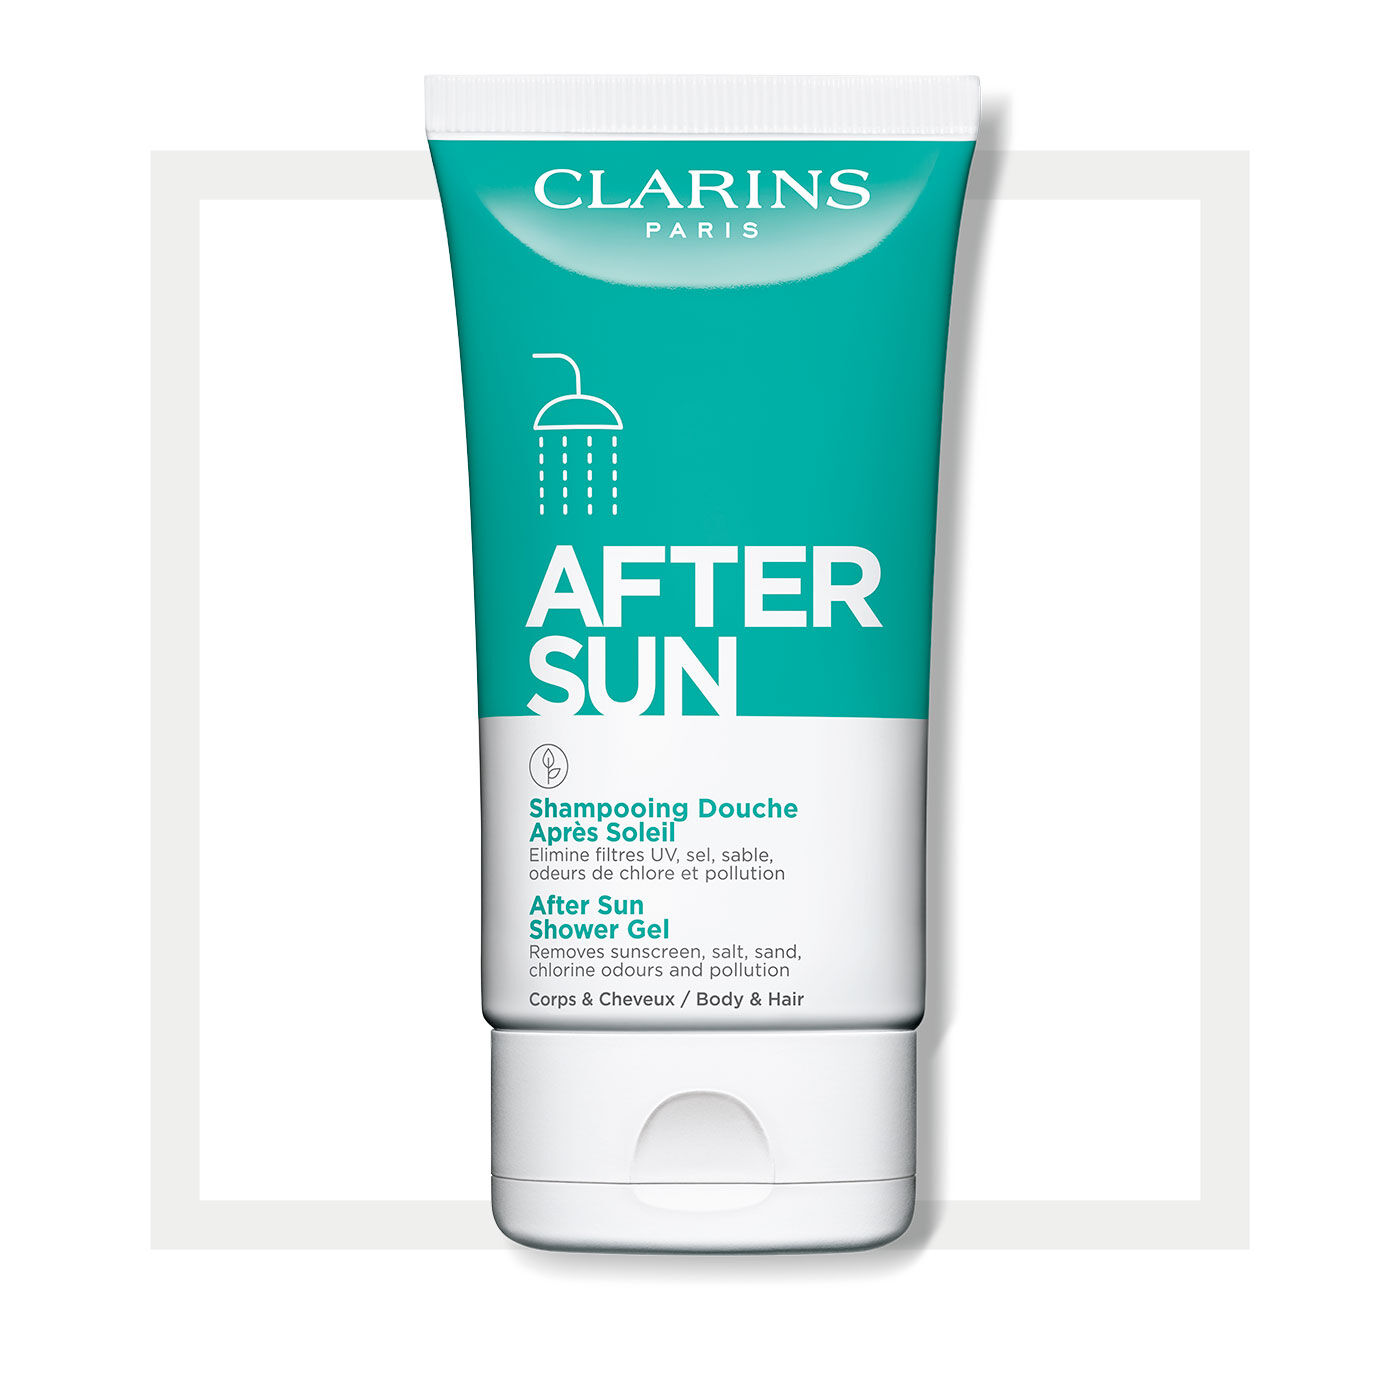 After-Sun Duschgel & Shampoo